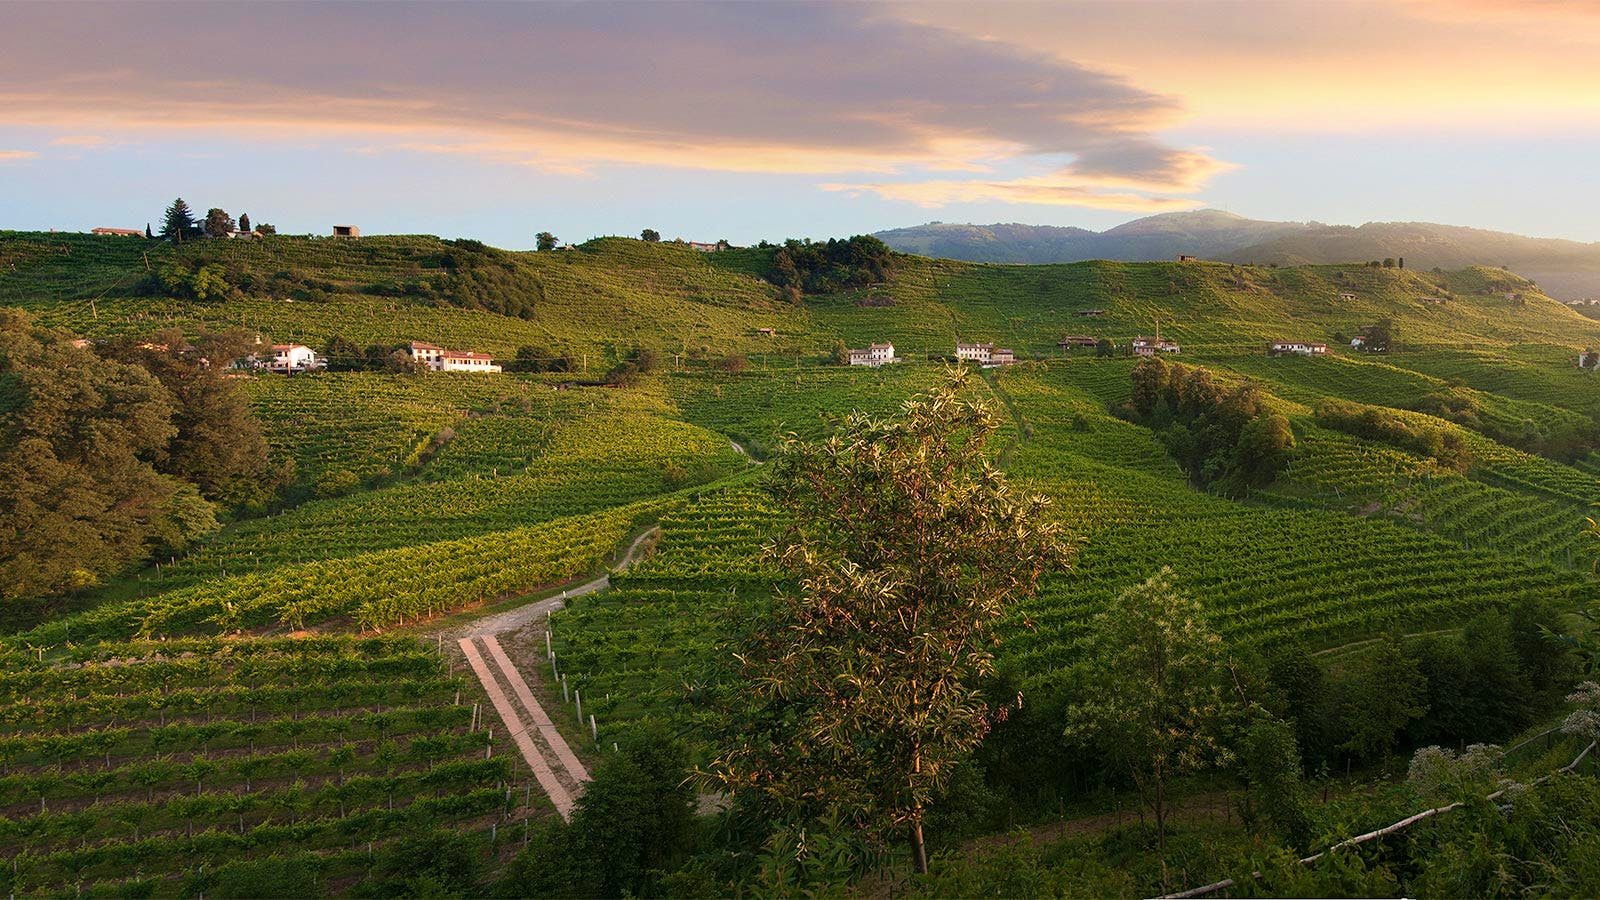 UNESCO Recognizes Prosecco Wine Areas as World Heritage Site